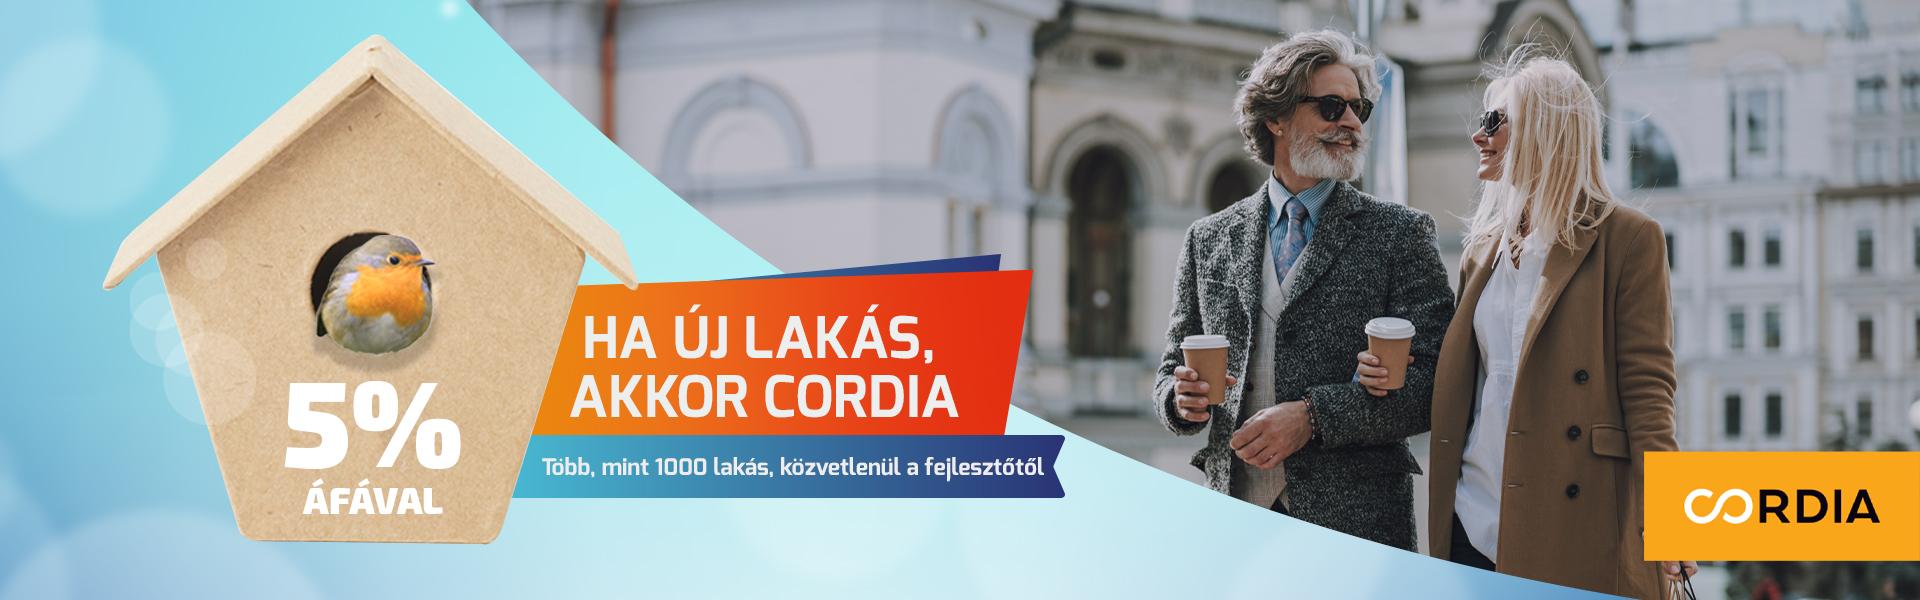 crd arengedmeny kampany belvarosi szegmens 1920x600 20210301